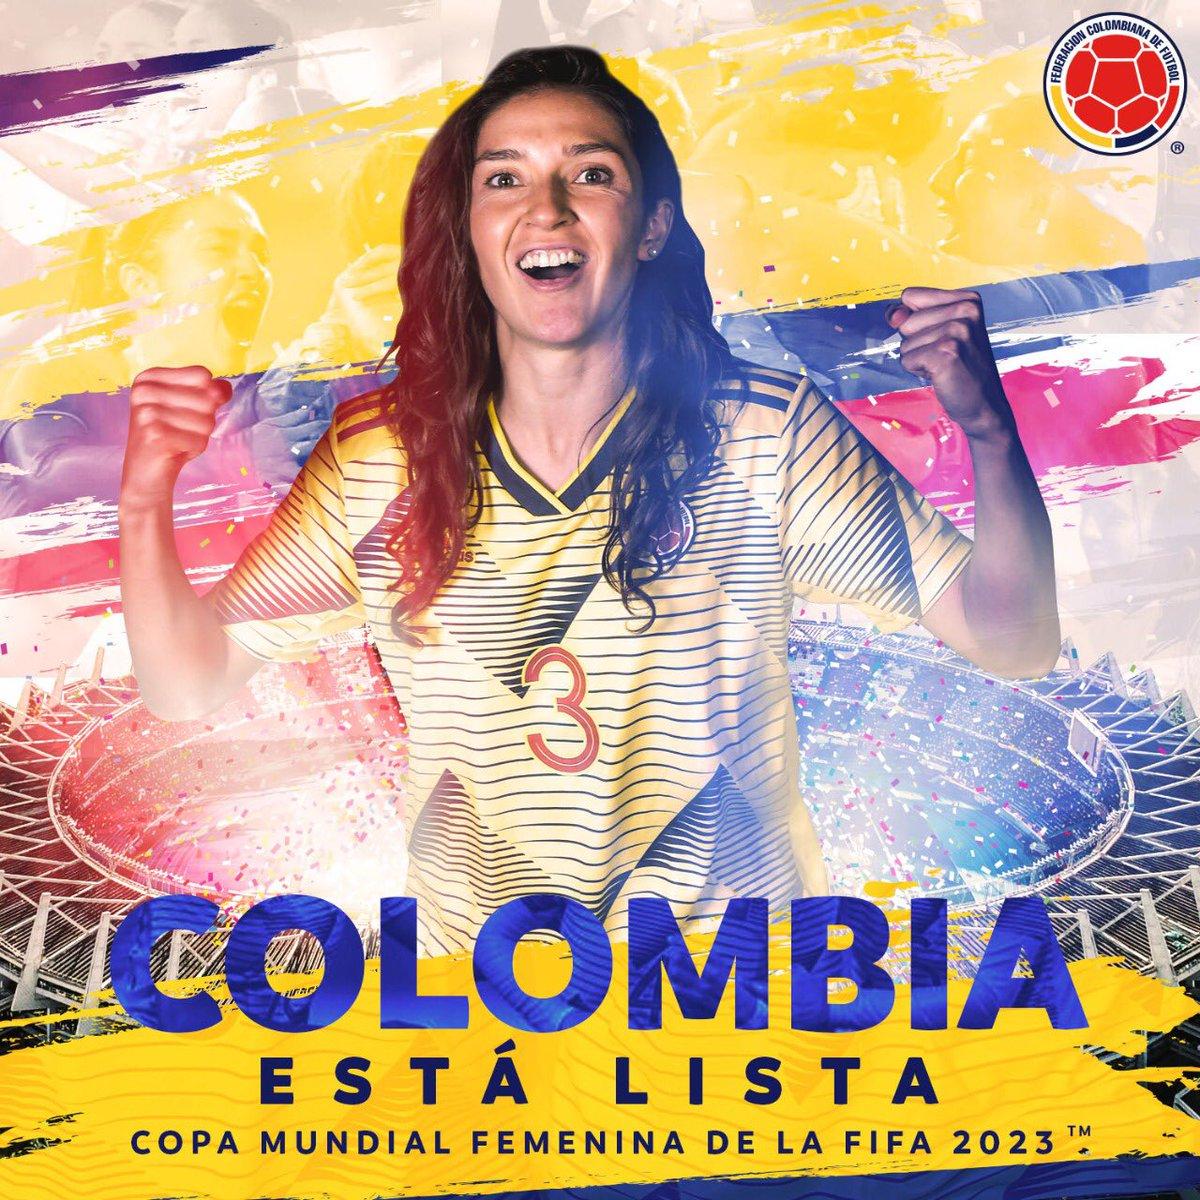 ⚽️ La primera Copa Mundial Femenina 🏆 que hará vibrar al mundo desde Sudamerica #ColombiaEstáLista 🇨🇴 @FCFSeleccionCol https://t.co/saHUo5OIPm